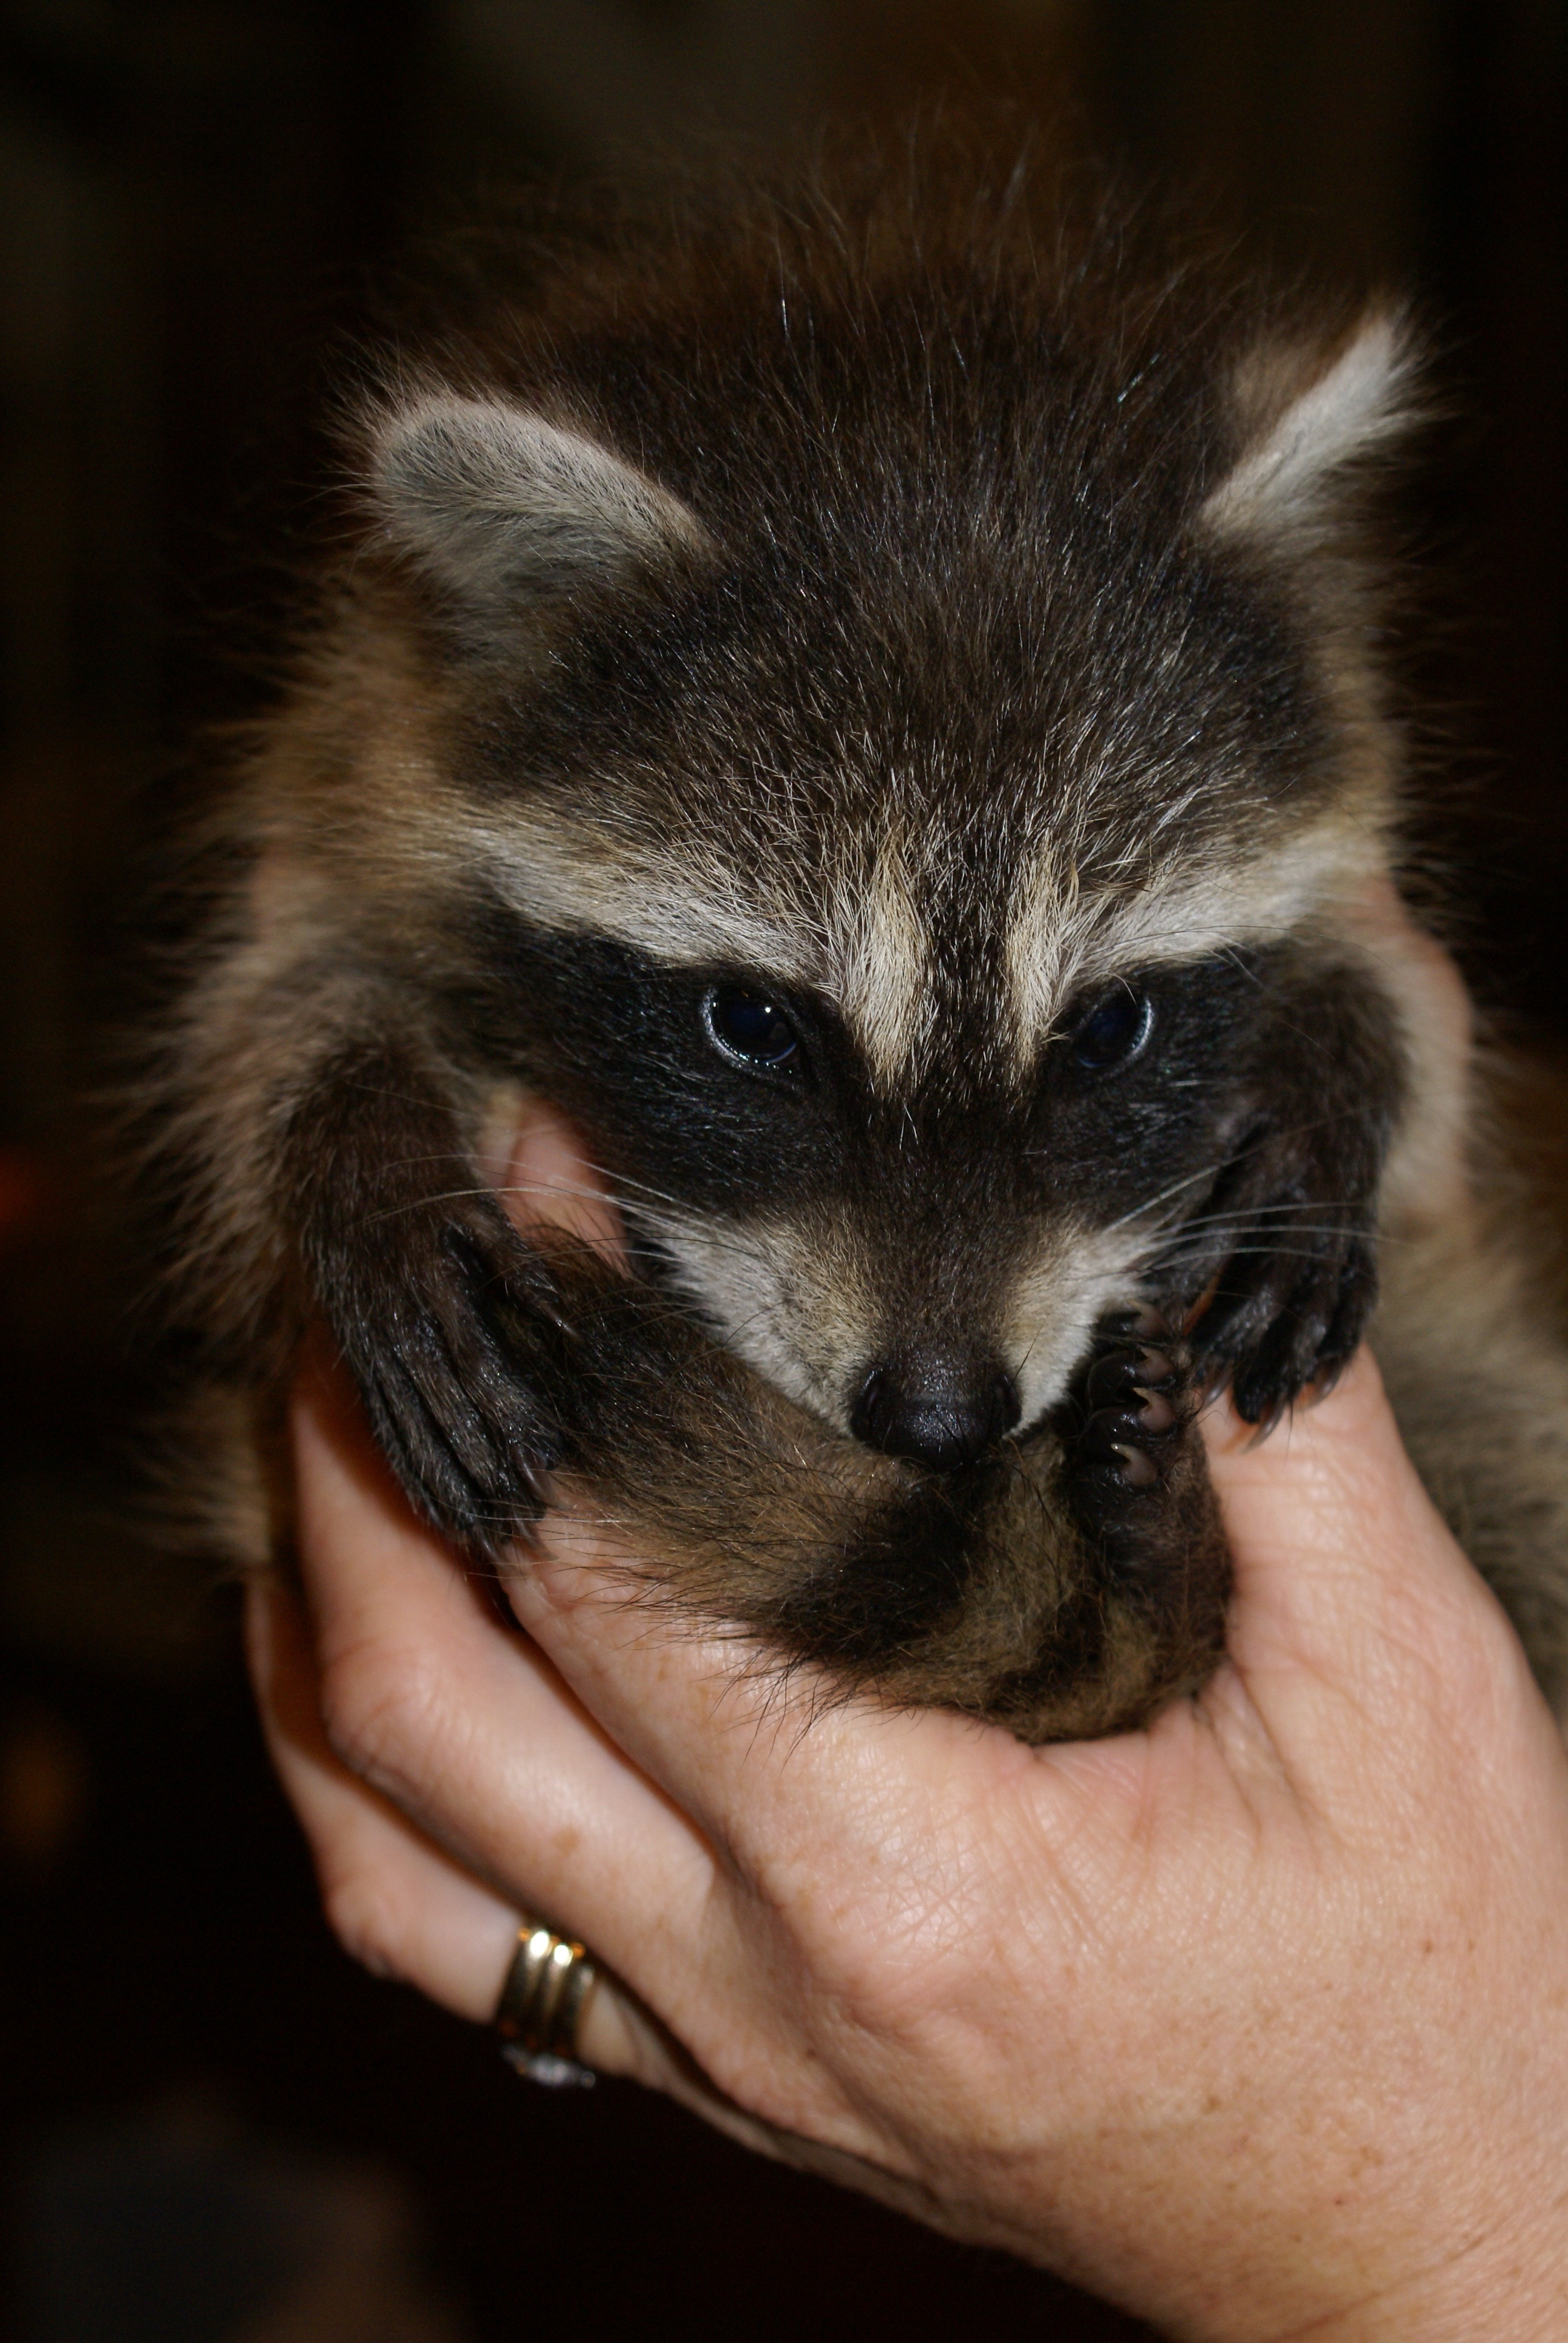 File:Baby raccoon Oct 2009.jpg - Wikimedia Commons Raccoon With Rabies